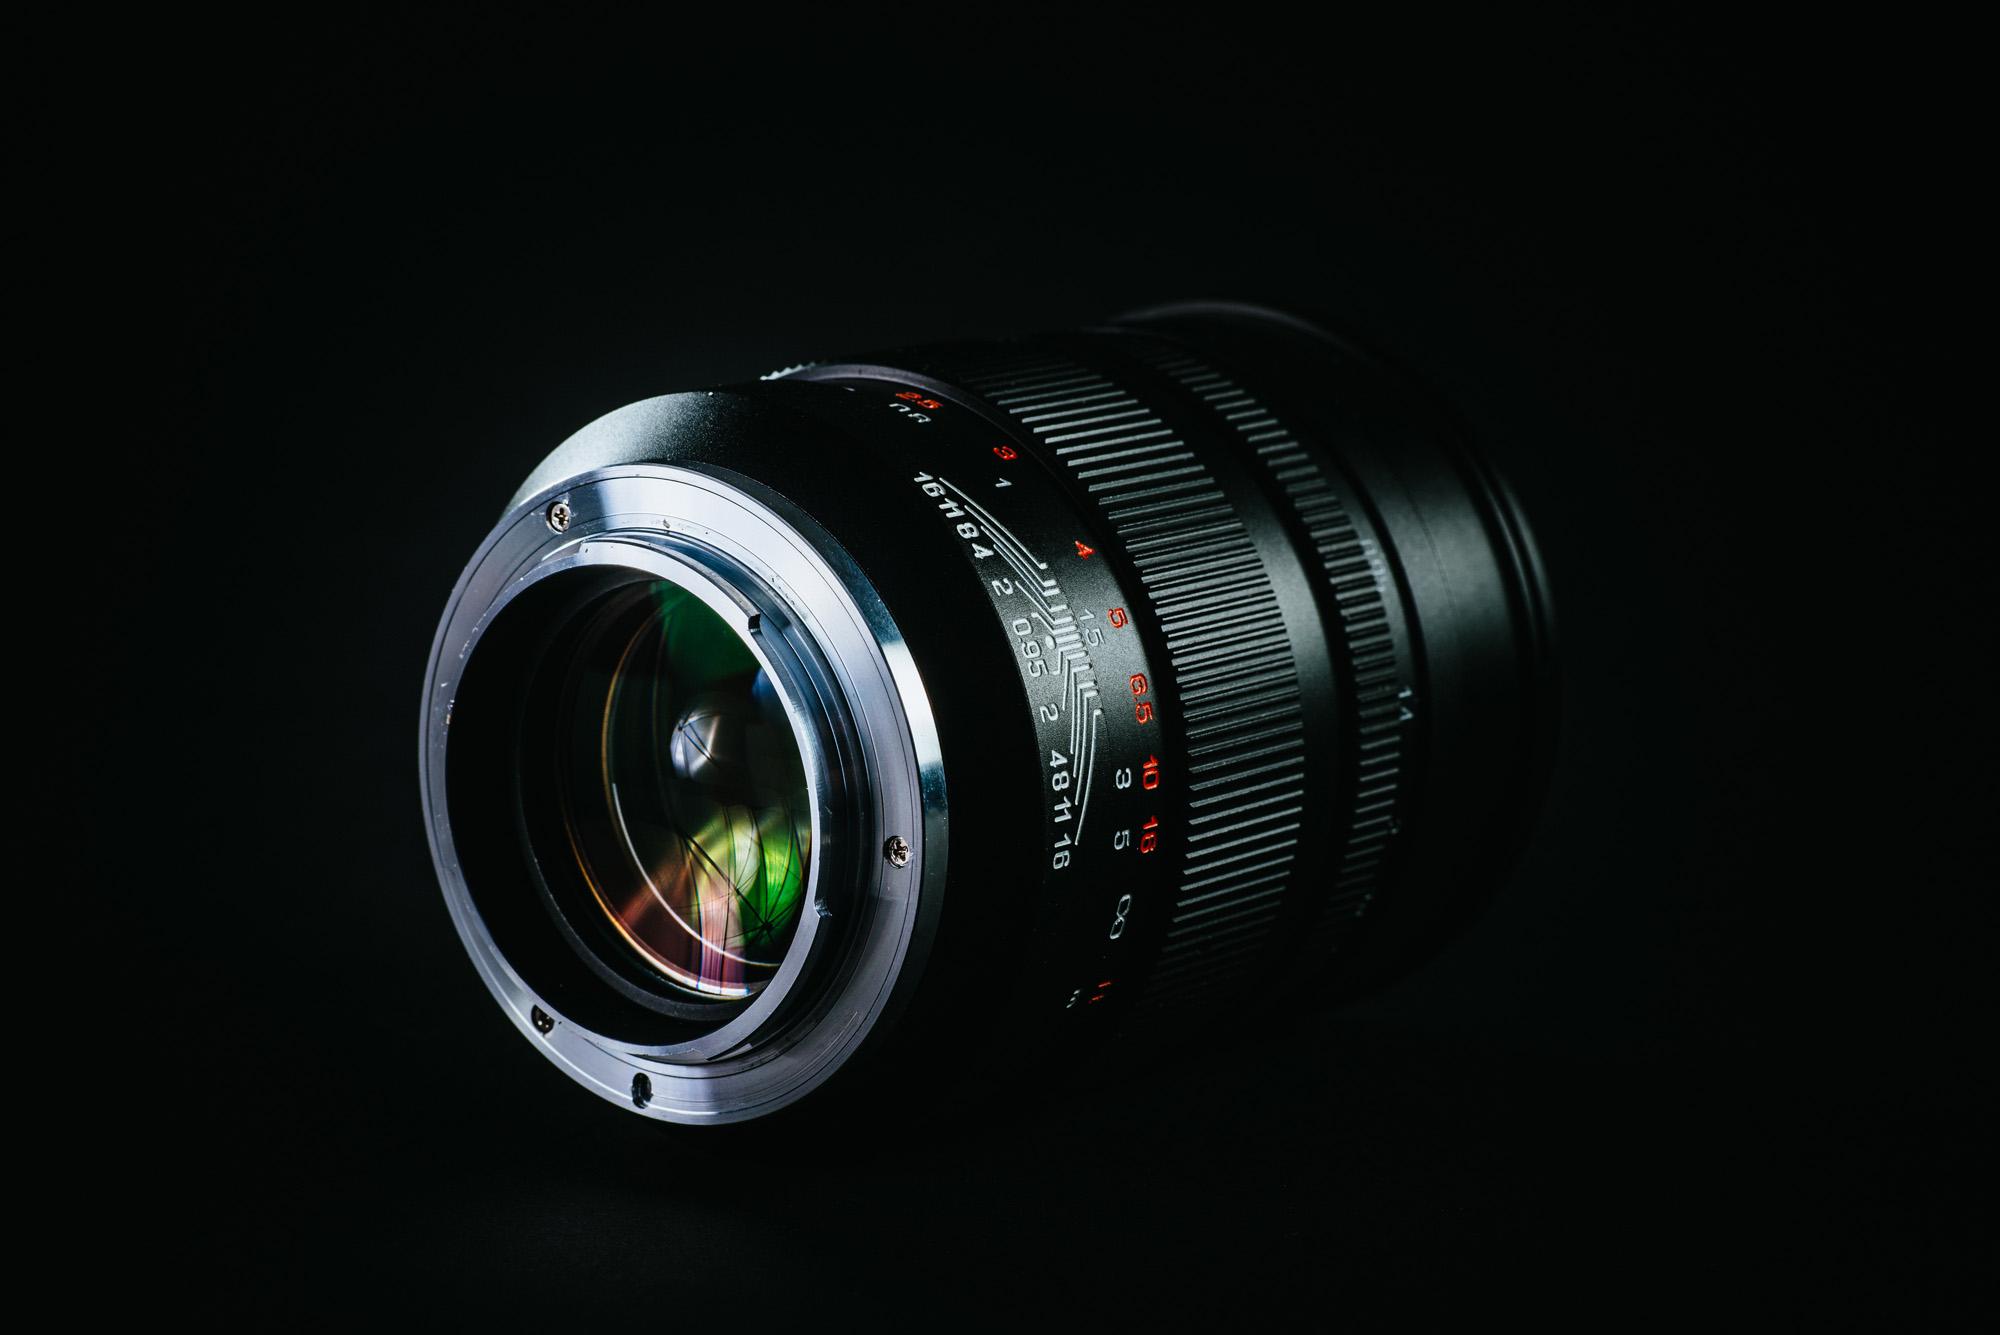 Mitakon-speedmaster-50mm-0.95-review04